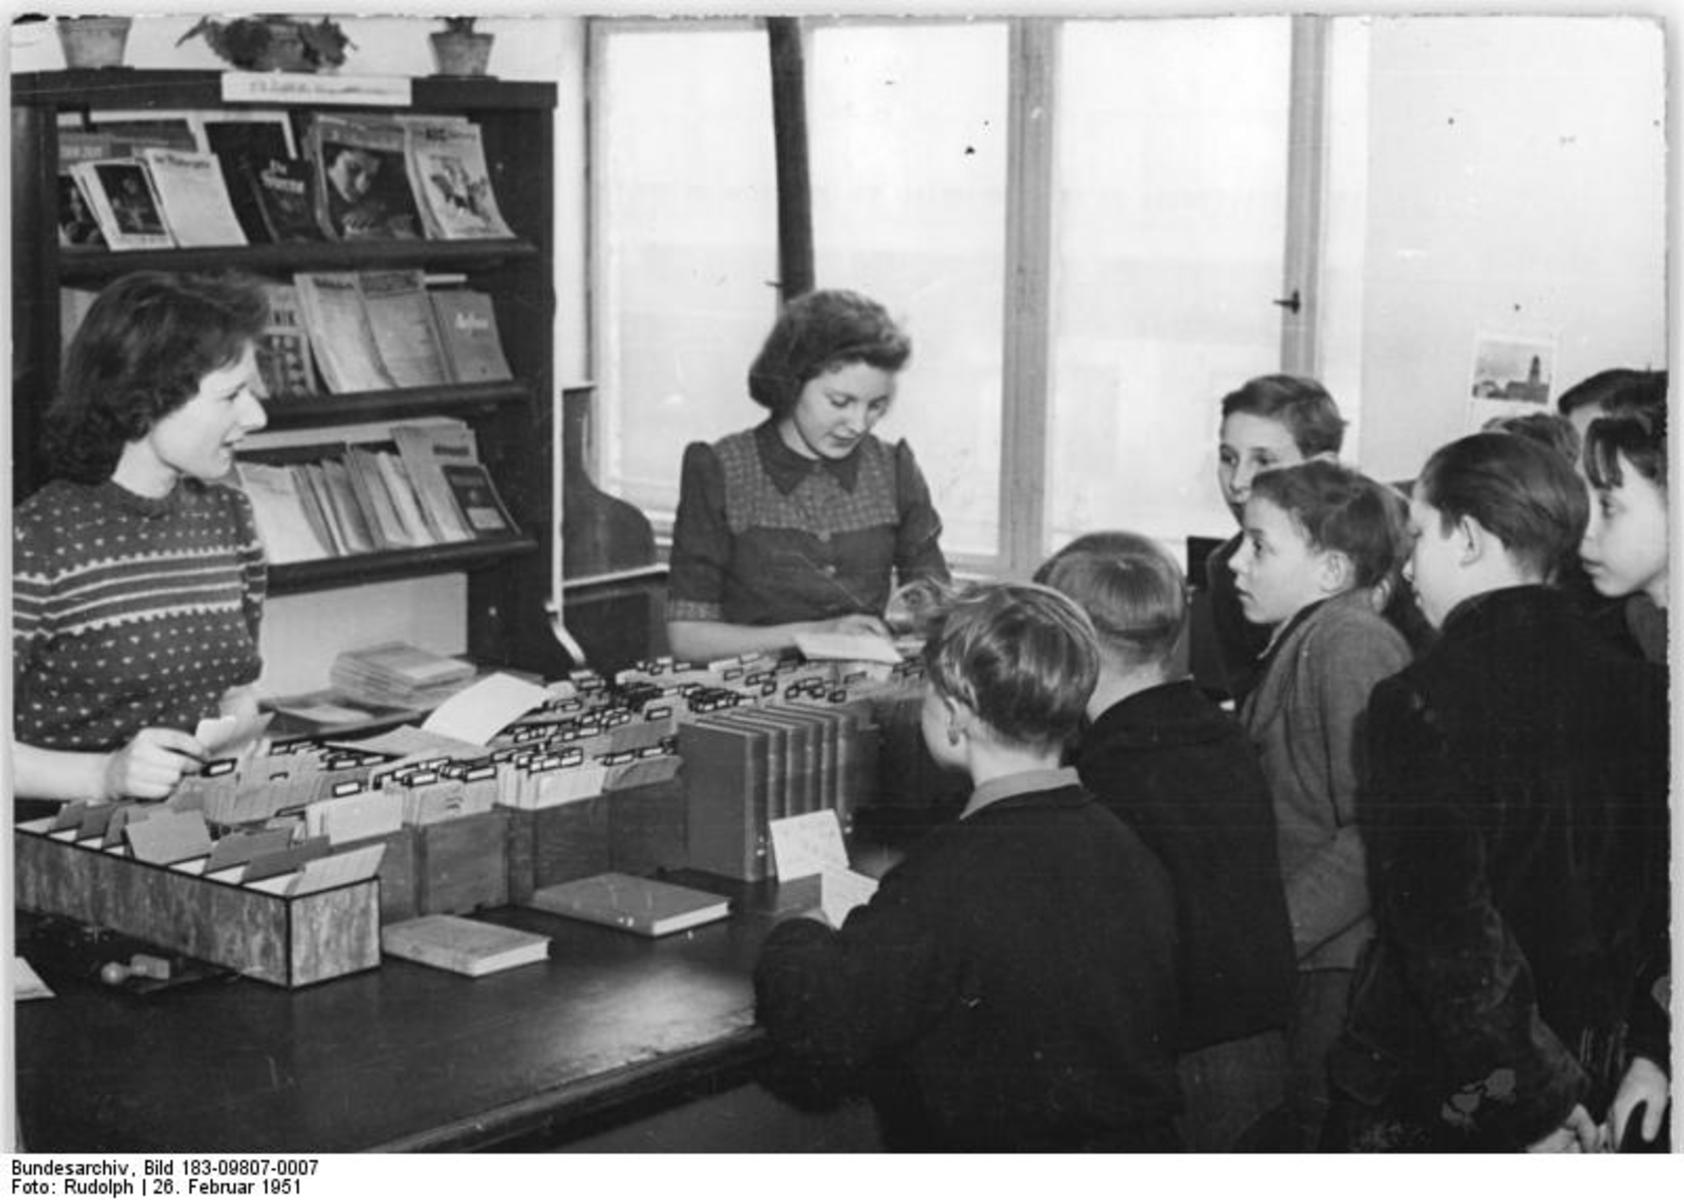 Bundesarchiv_Bild_183-09807-0007,_Berlin,_Jugendbücherei_Prenzlauer_Berg,_Katalog.jpg